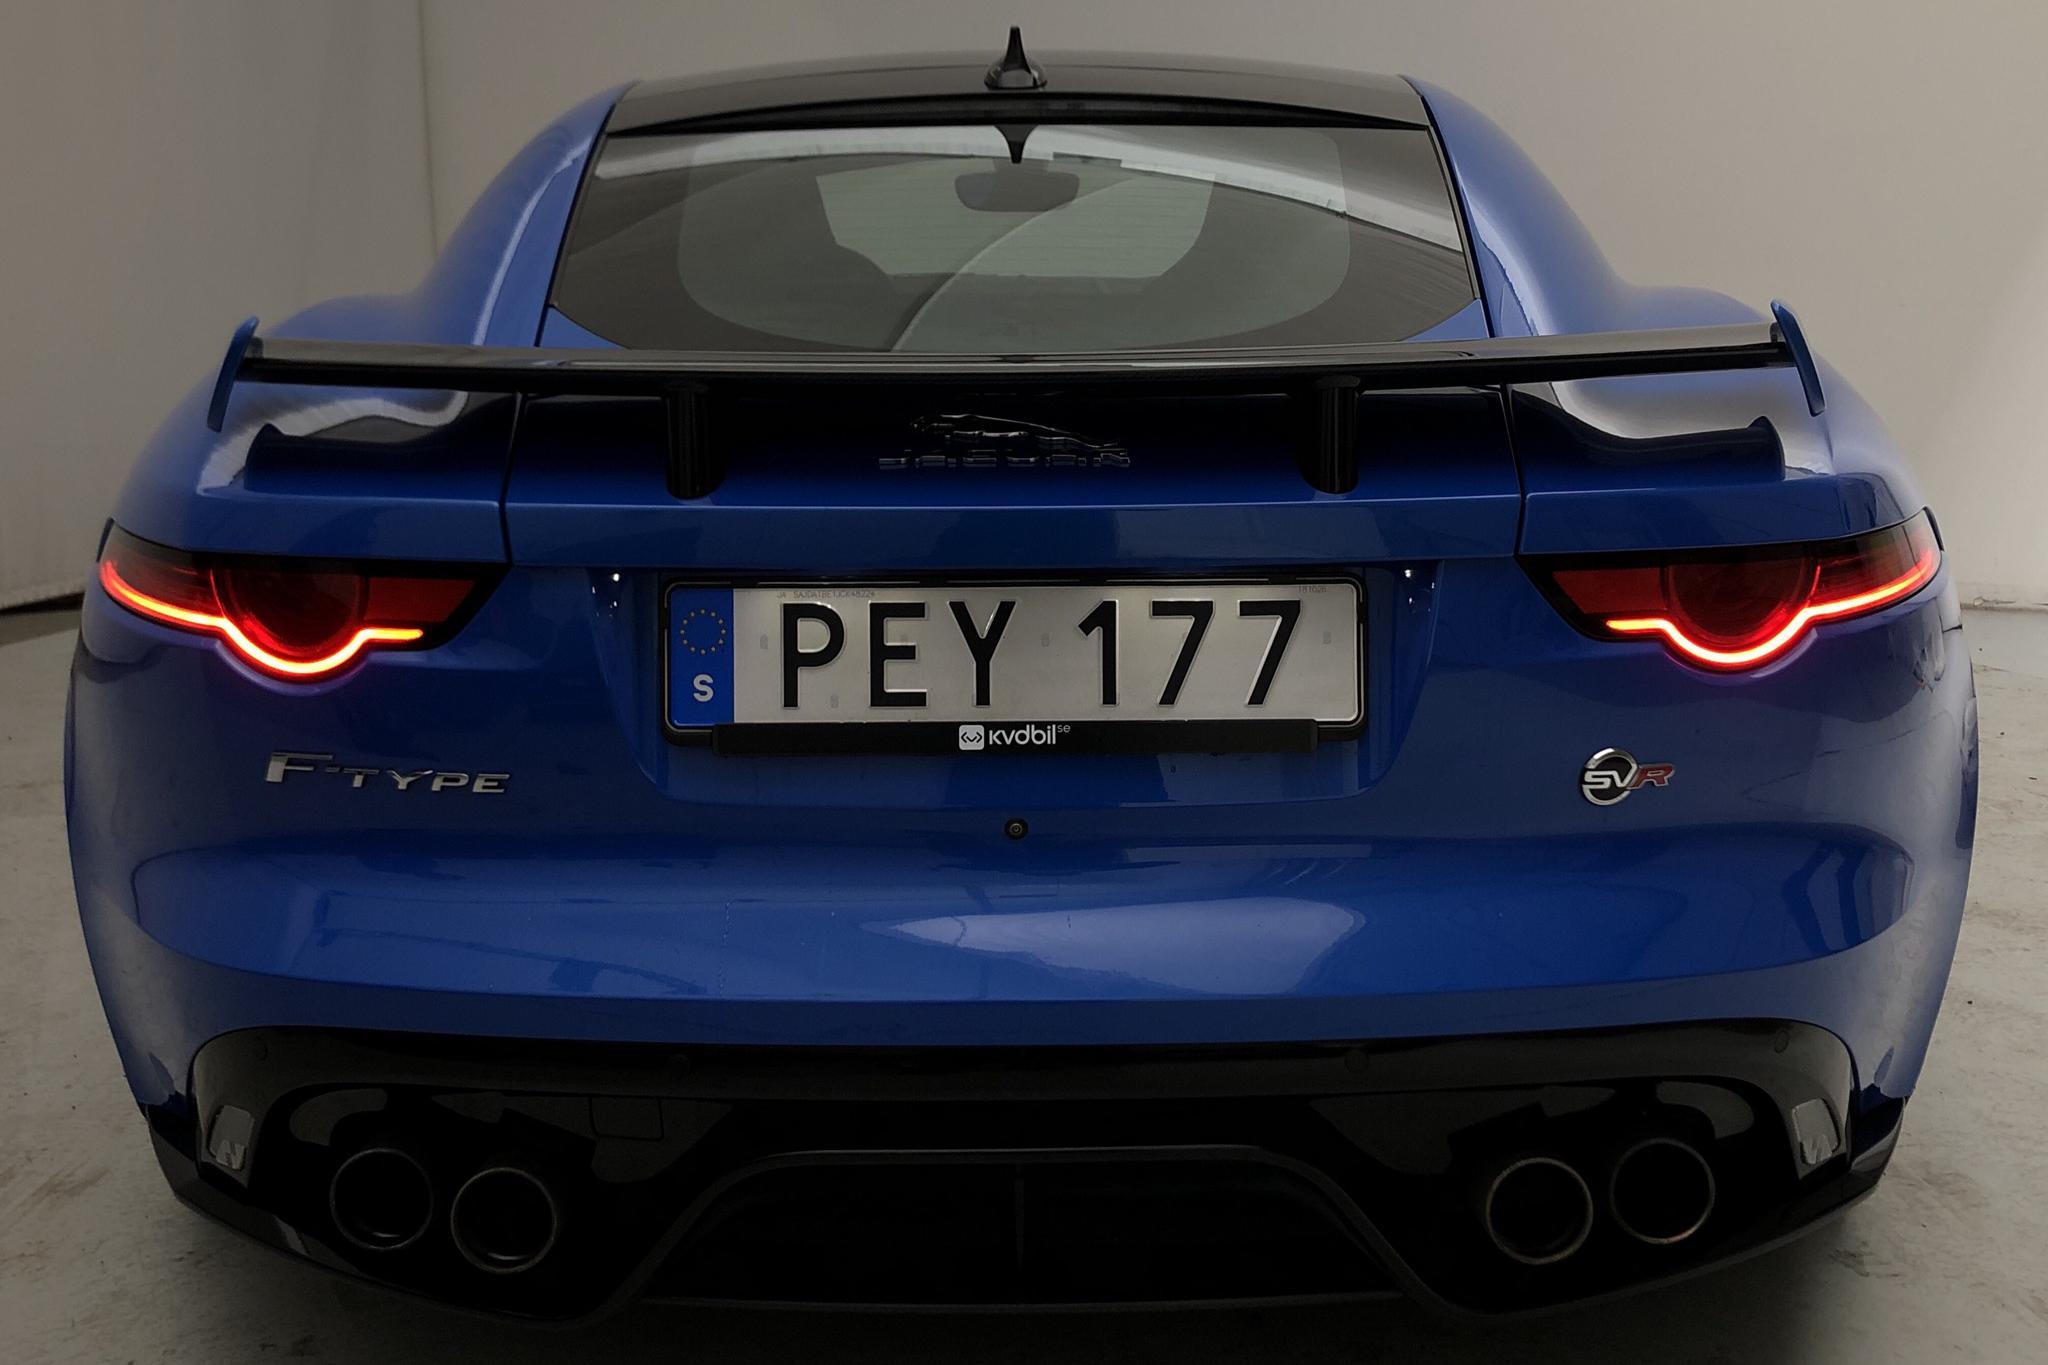 Jaguar F-Type 5.0 S/C V8 SVR AWD Coupé (575hk) - 2 943 mil - Automat - blå - 2018